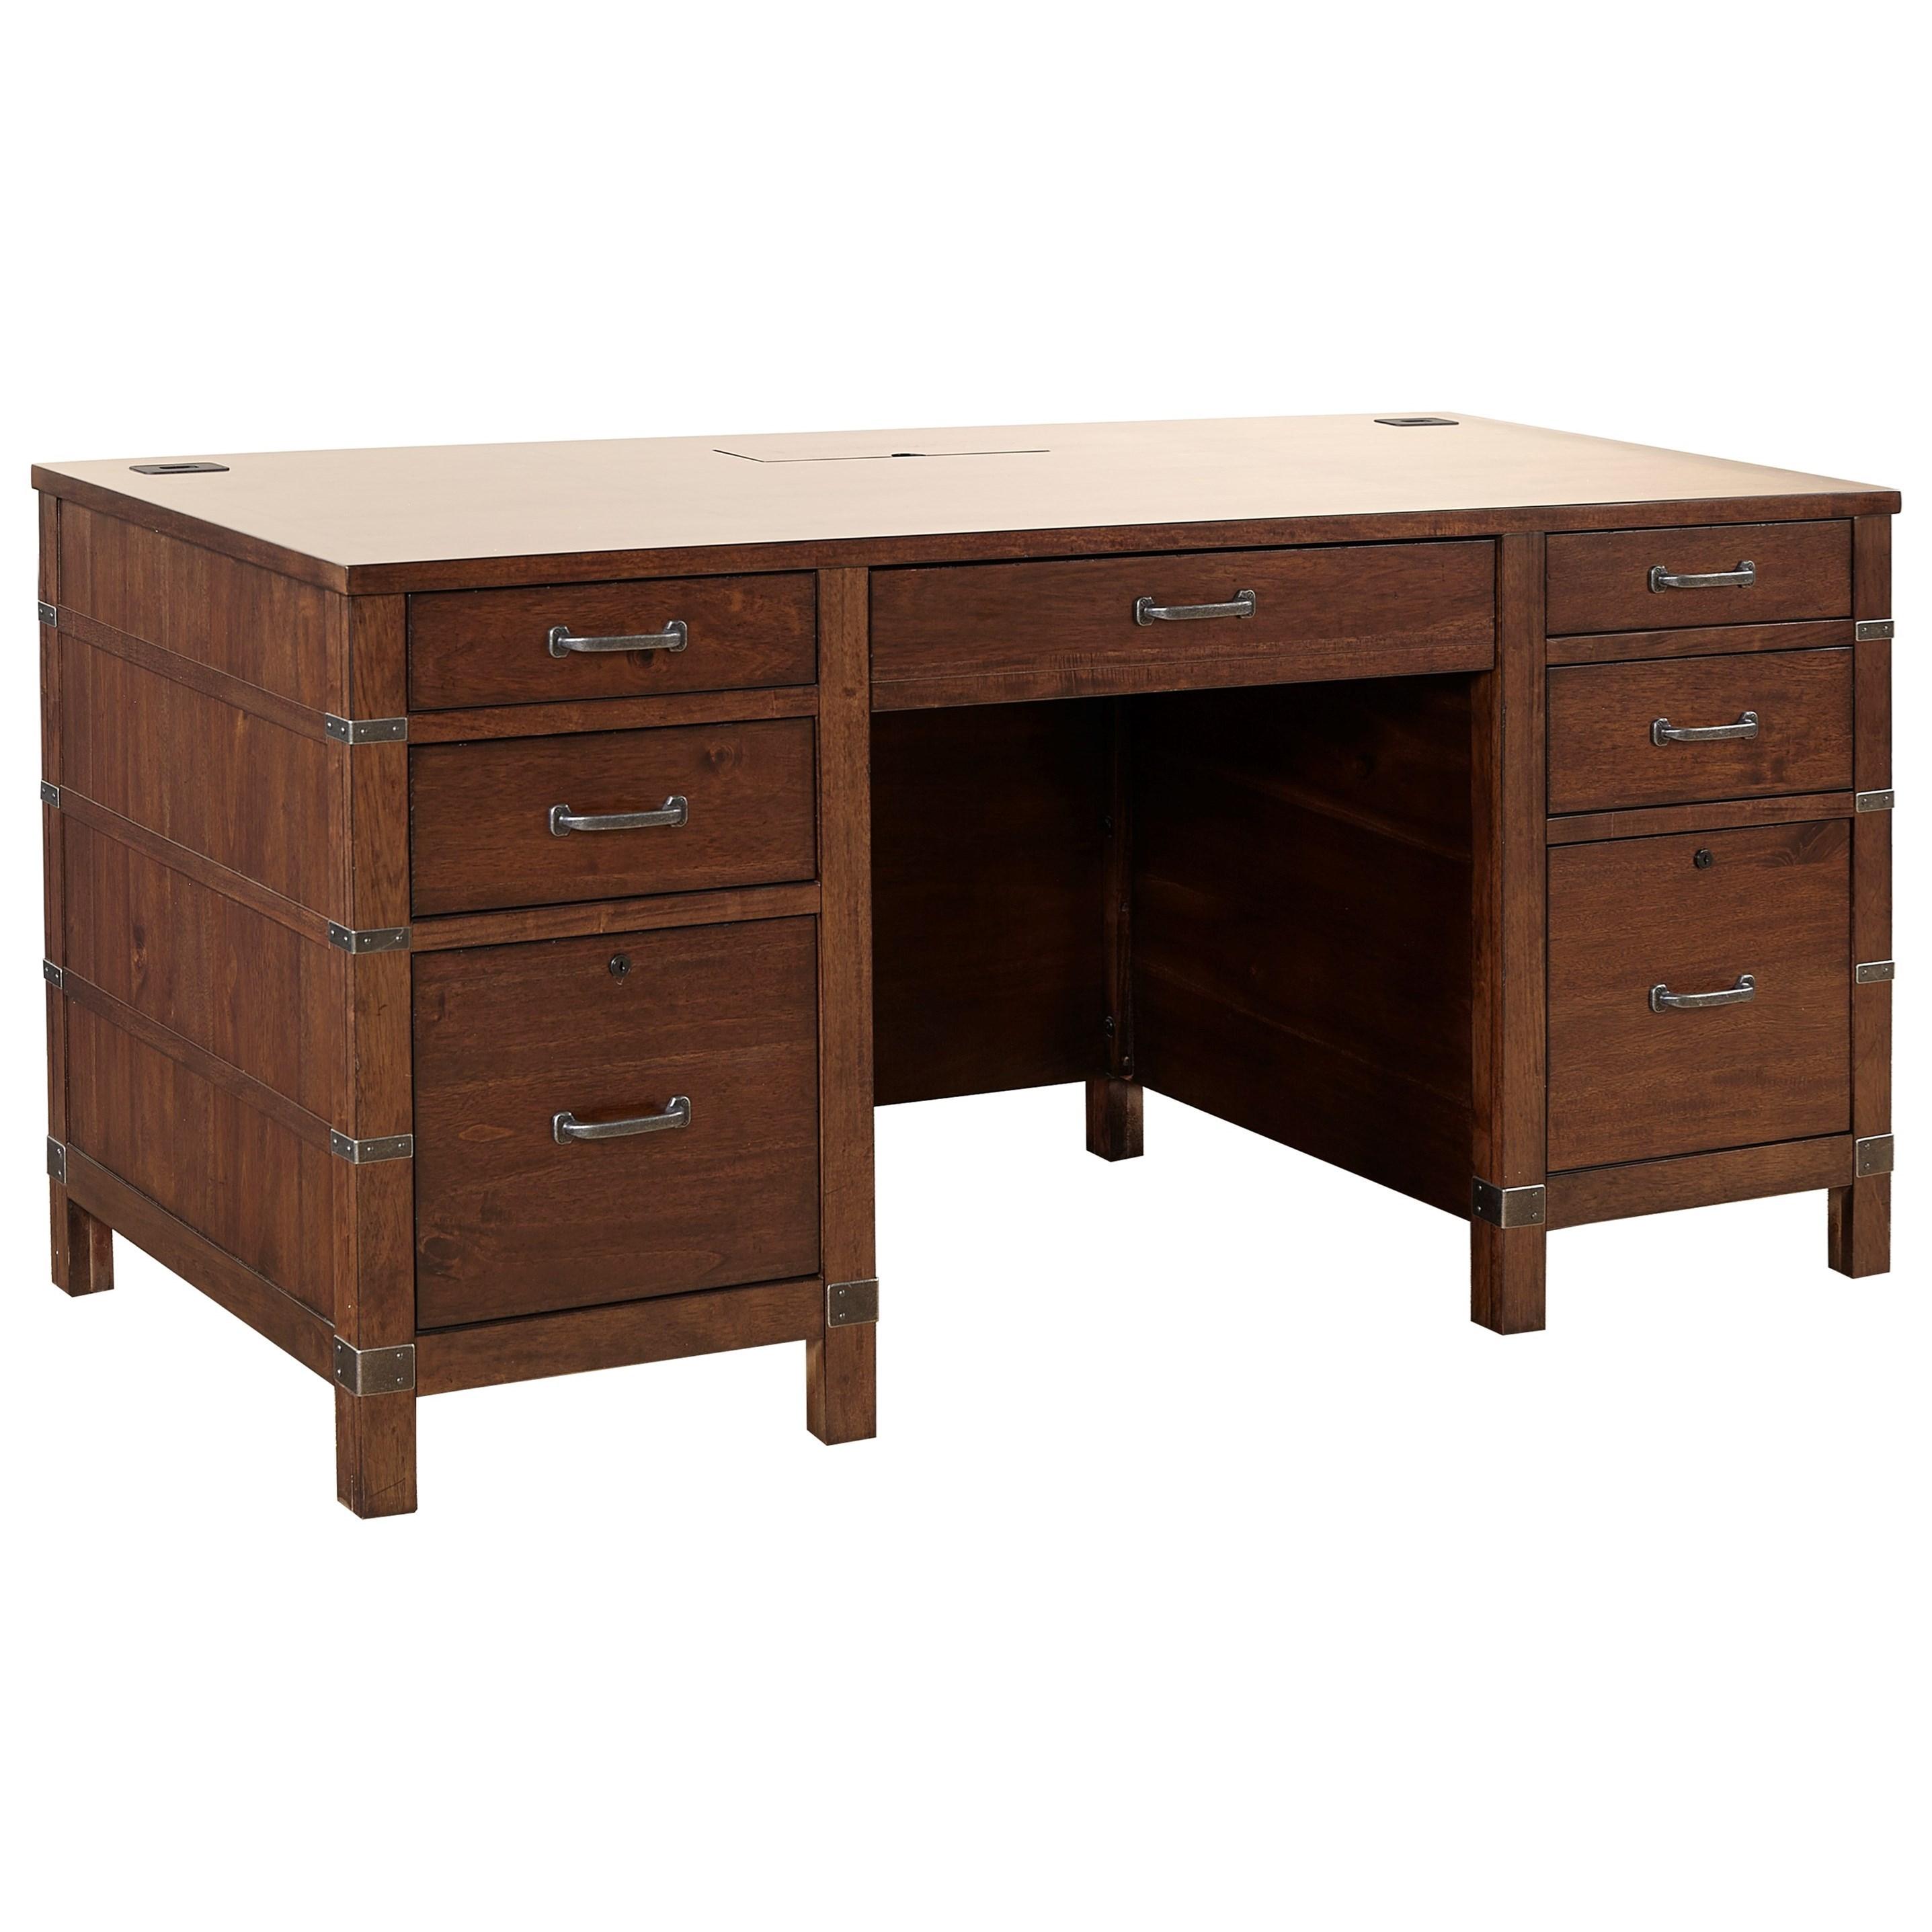 Aspenhome Canfield 66 Exec Desk With Ac Outlets Wayside Furniture Double Pedestal Desks